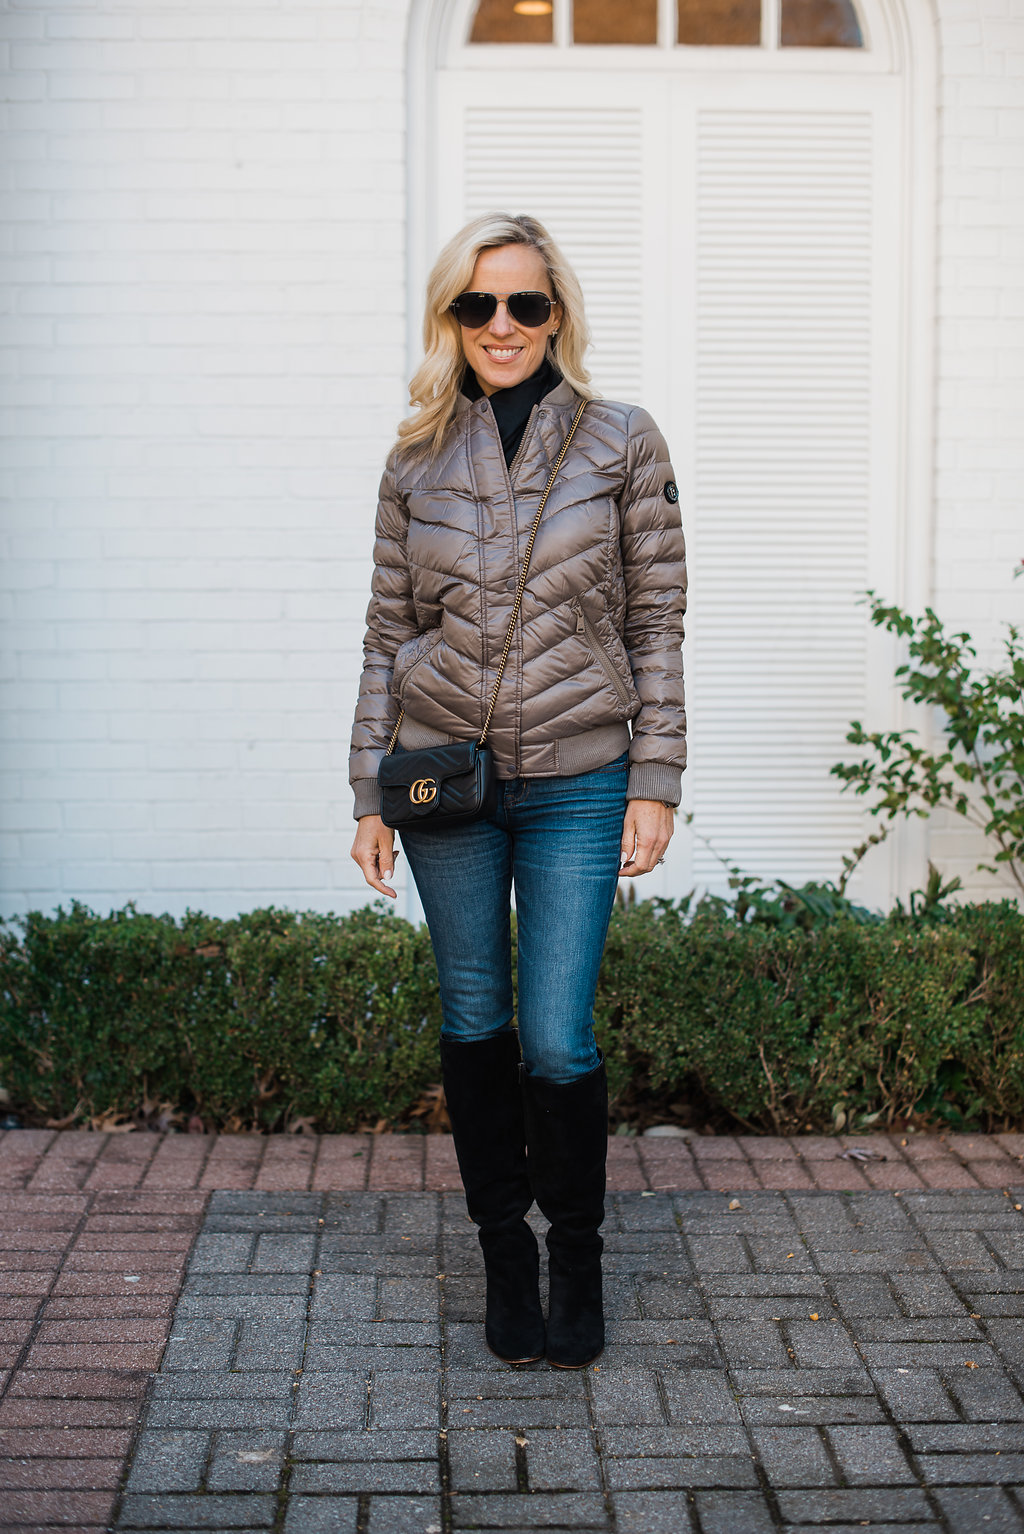 Alicia Wood, Dallas Lifestyle Blogger, Dallas Fashion Blogger, Bernardo Fashions, Bernardo Travel Jacket, Packable Travel Jacket